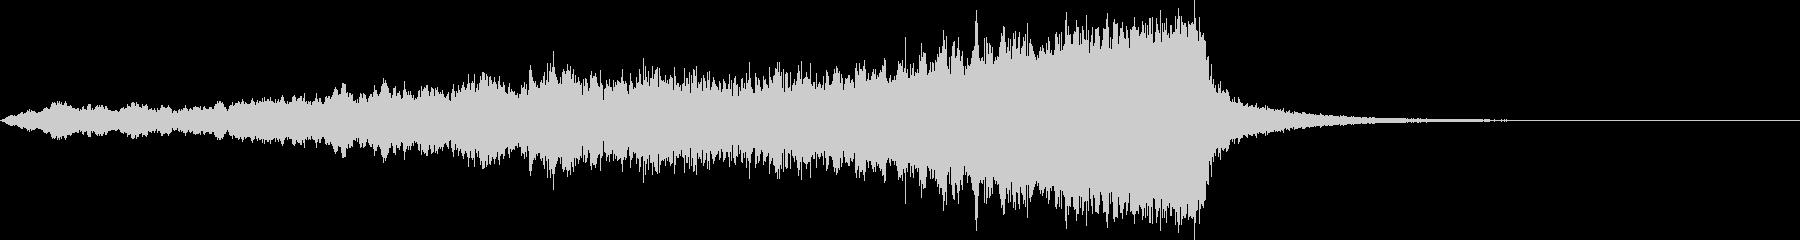 CINEMATIC RISER_34の未再生の波形